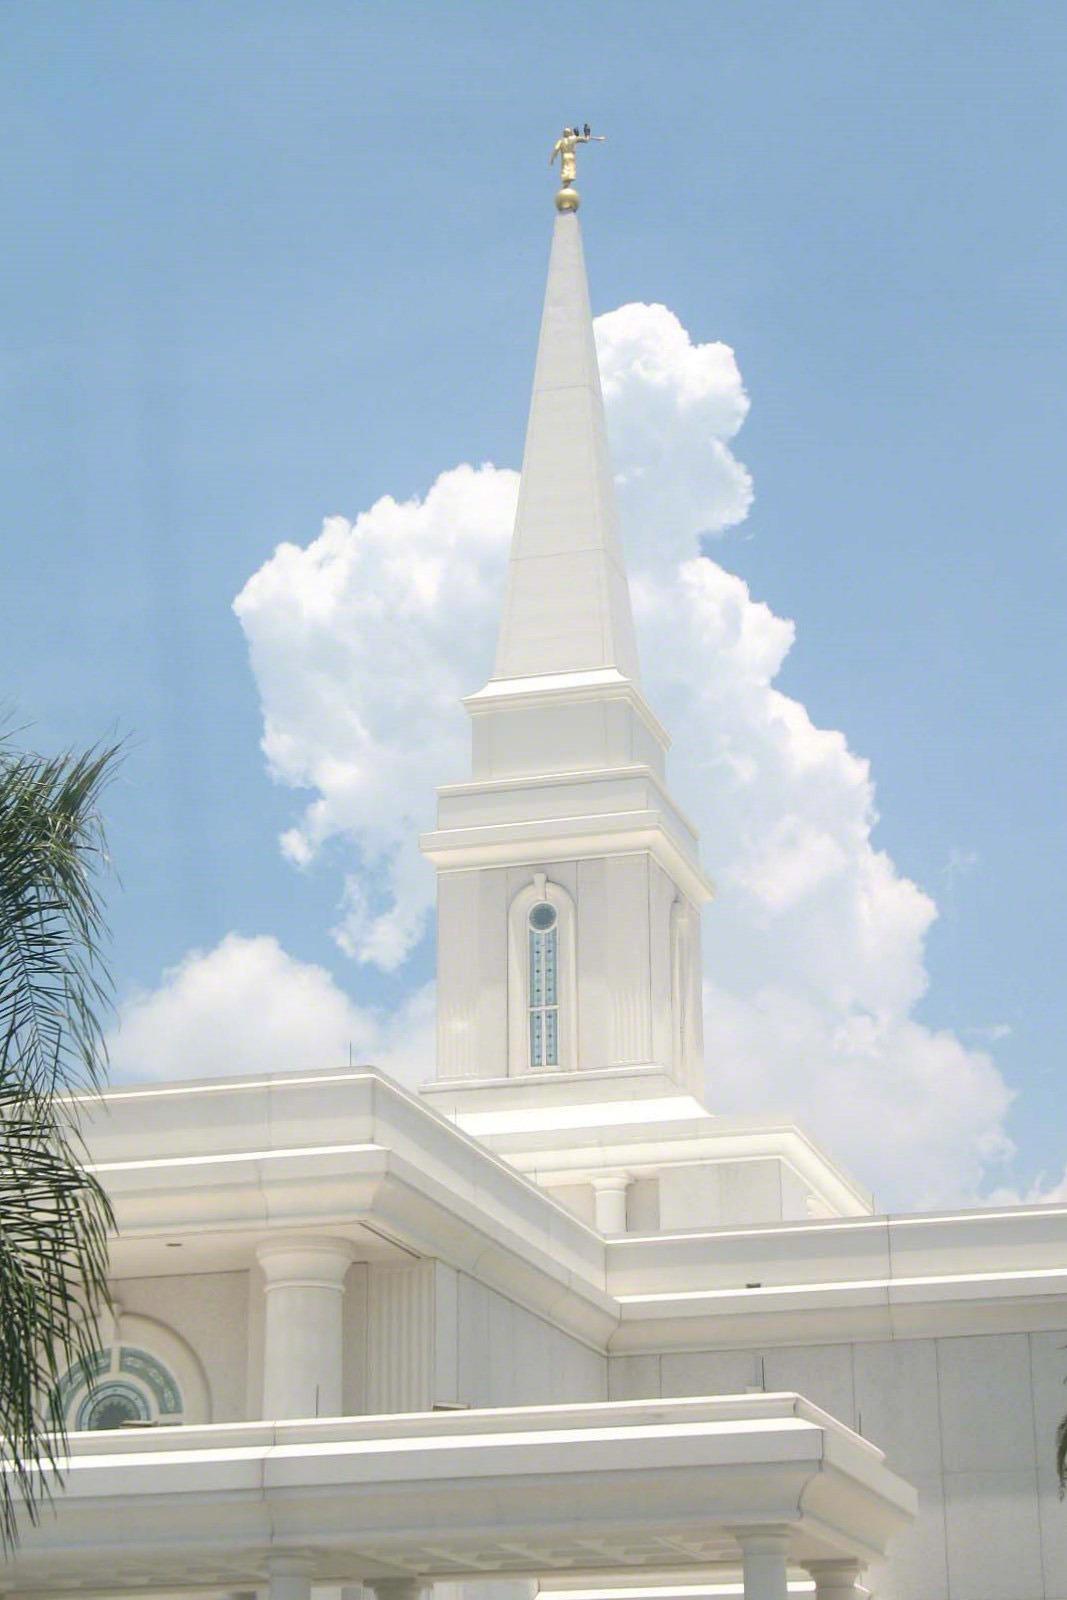 Inspirational Quotes Wallpaper Download Orlando Florida Temple Spire